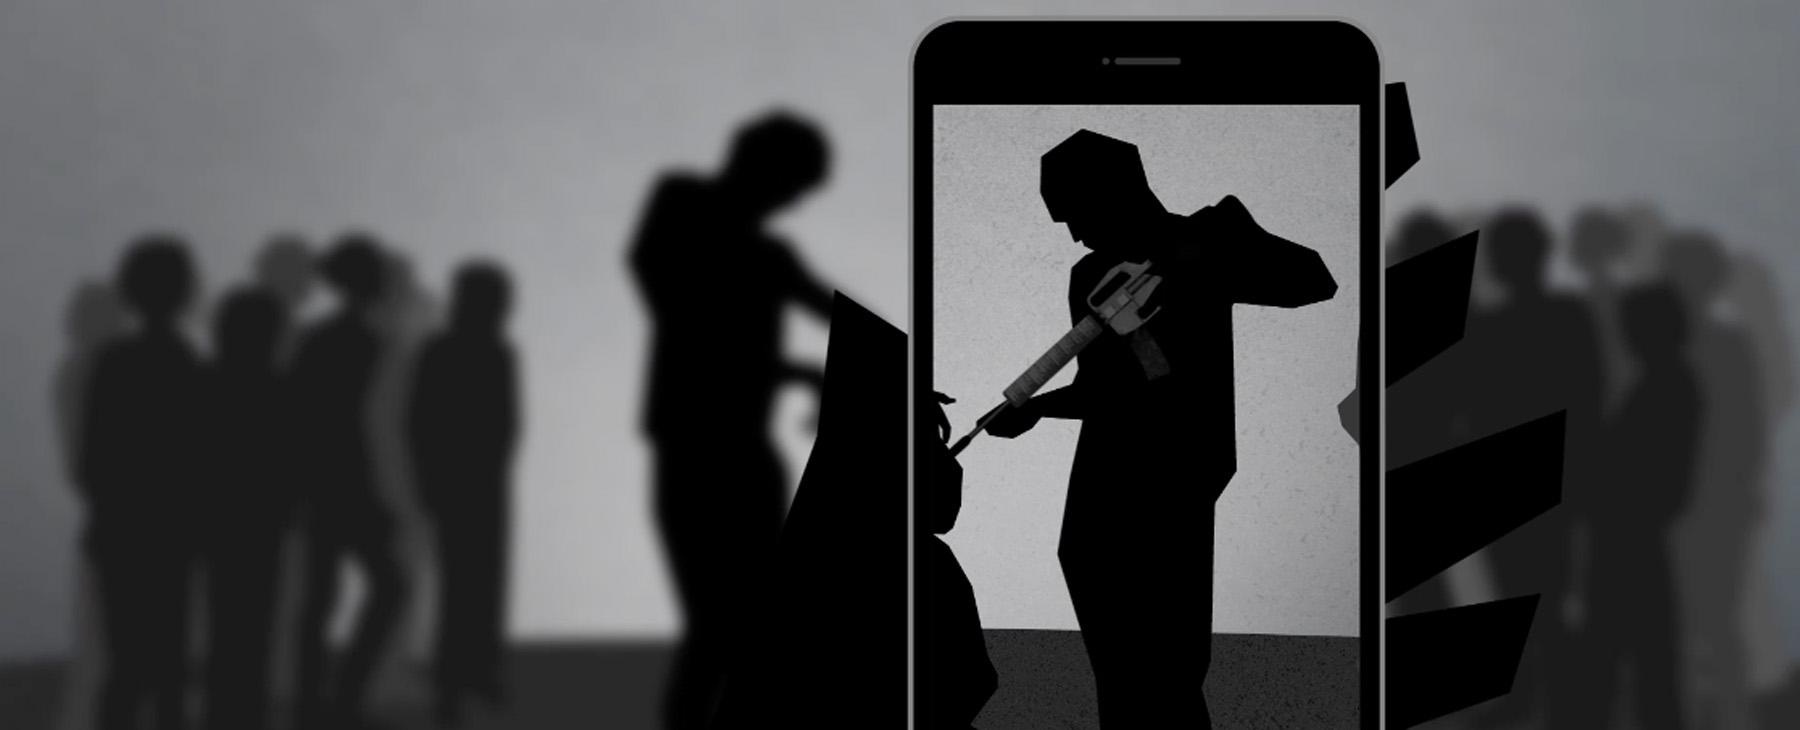 The smartphone app capturing the worst atrocities